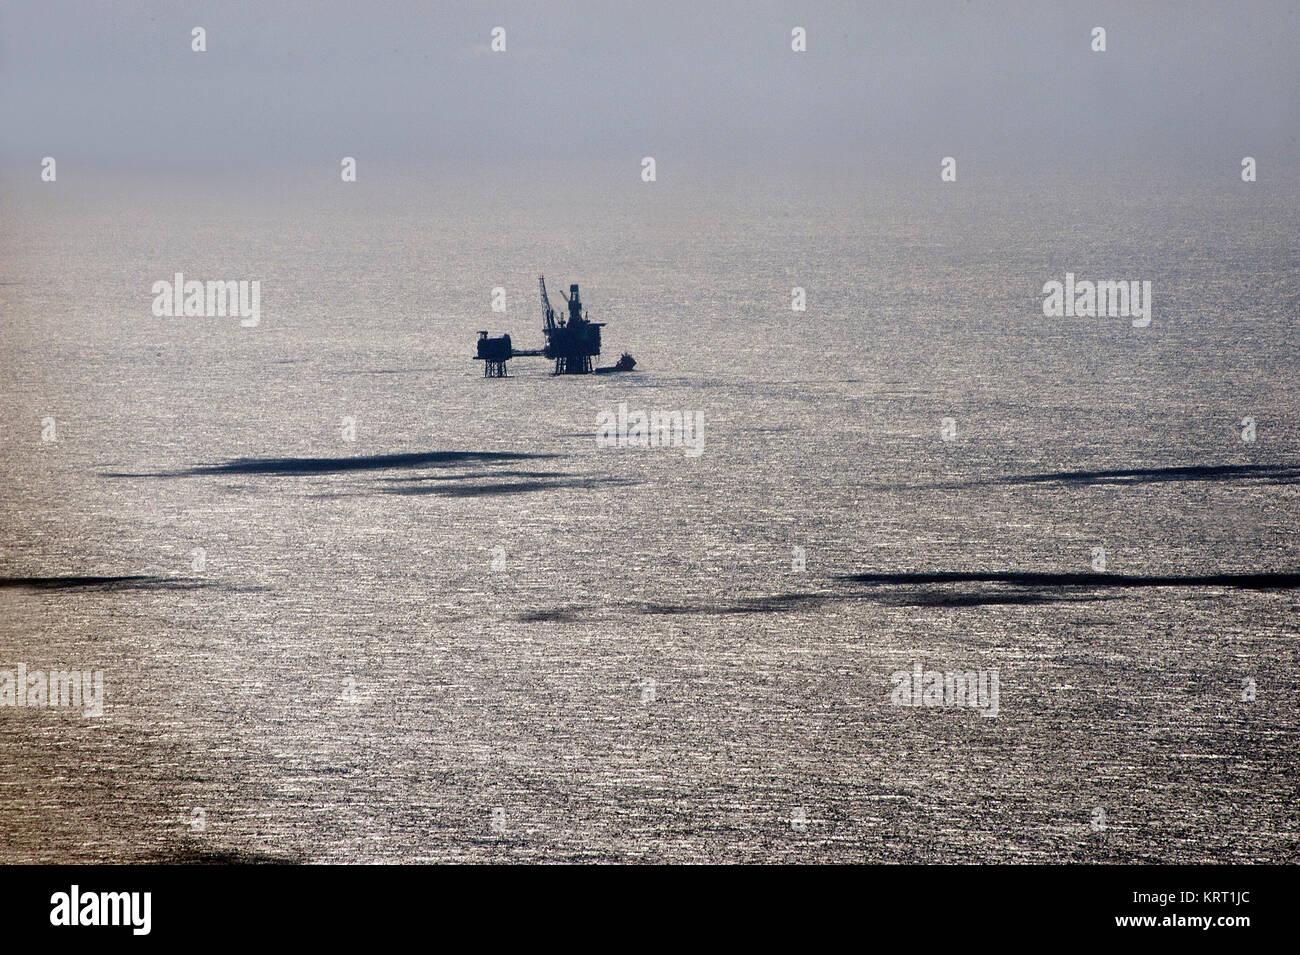 Nordsee, Öl Produktion mit Plattformen. Luftaufnahme. Stockbild